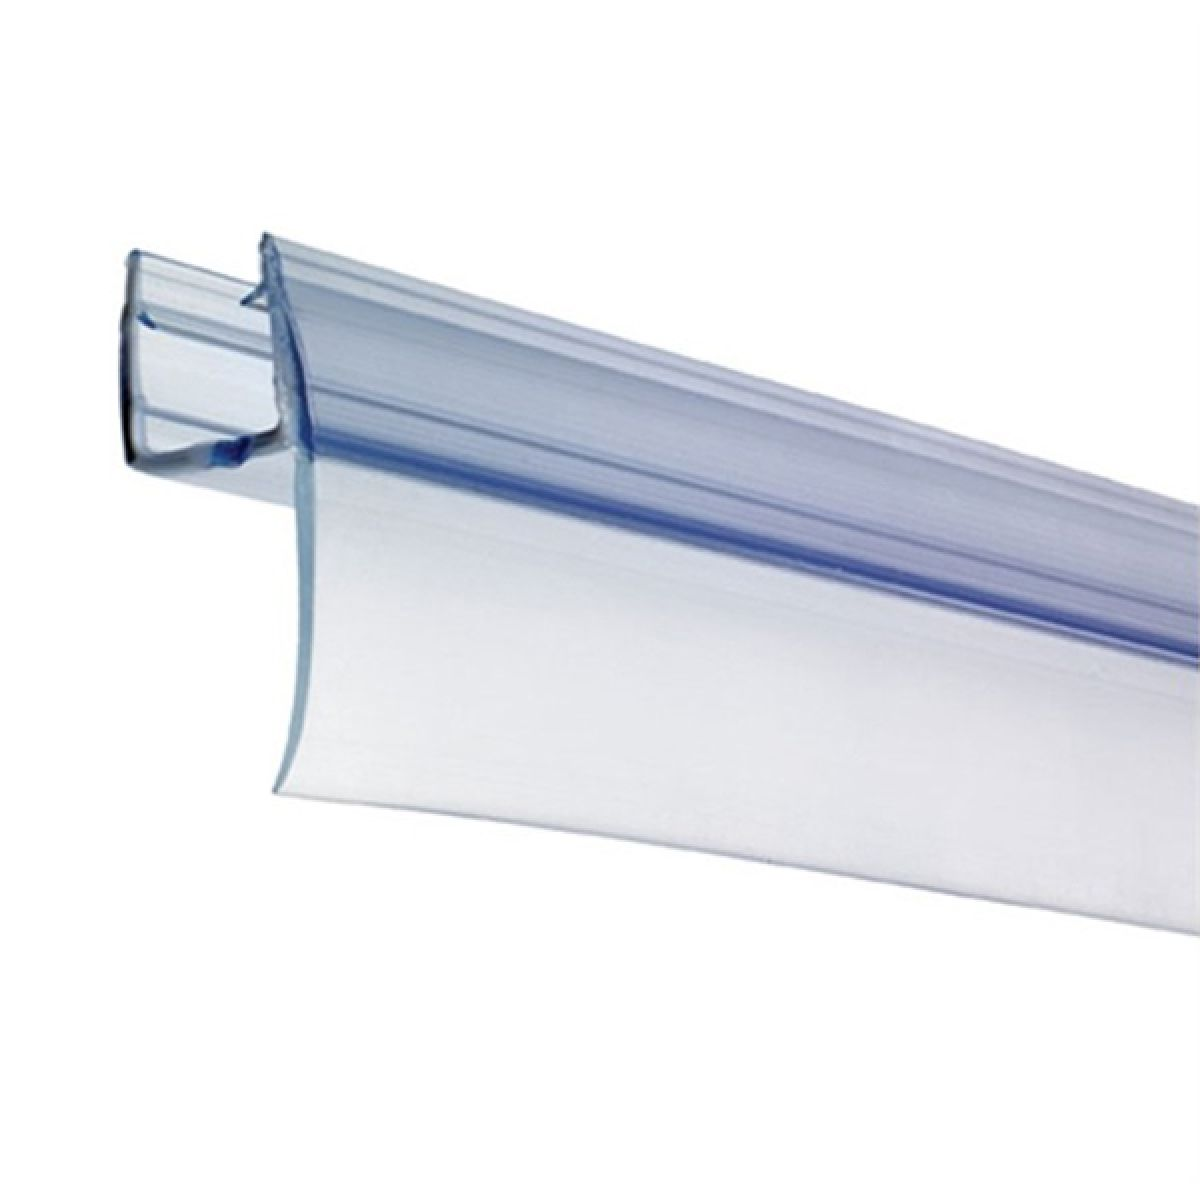 Croydex Bath Screen Seal Kit 1000mm - Wiper